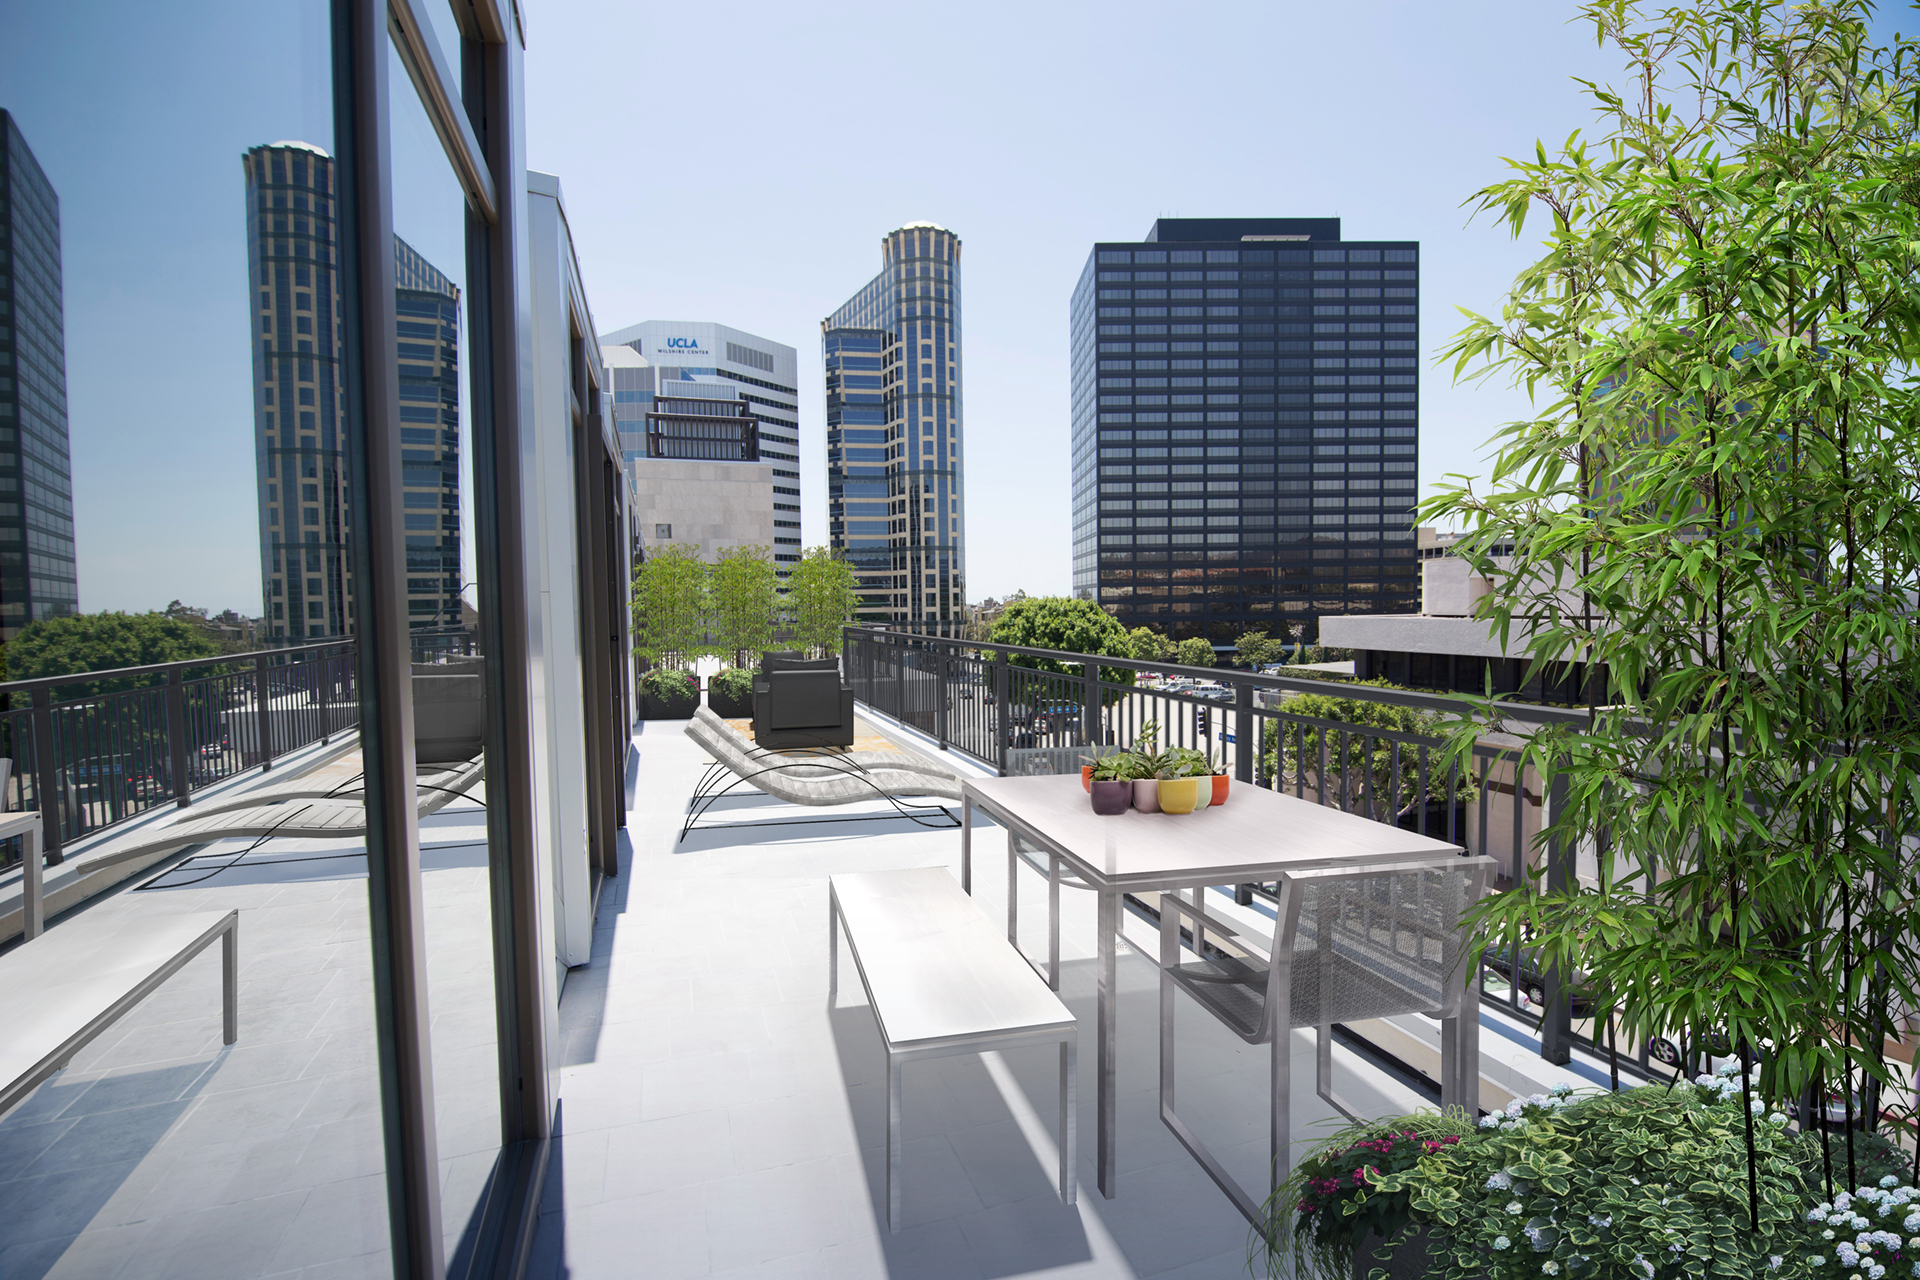 5 Rooftop-0731-1920x1280.jpg